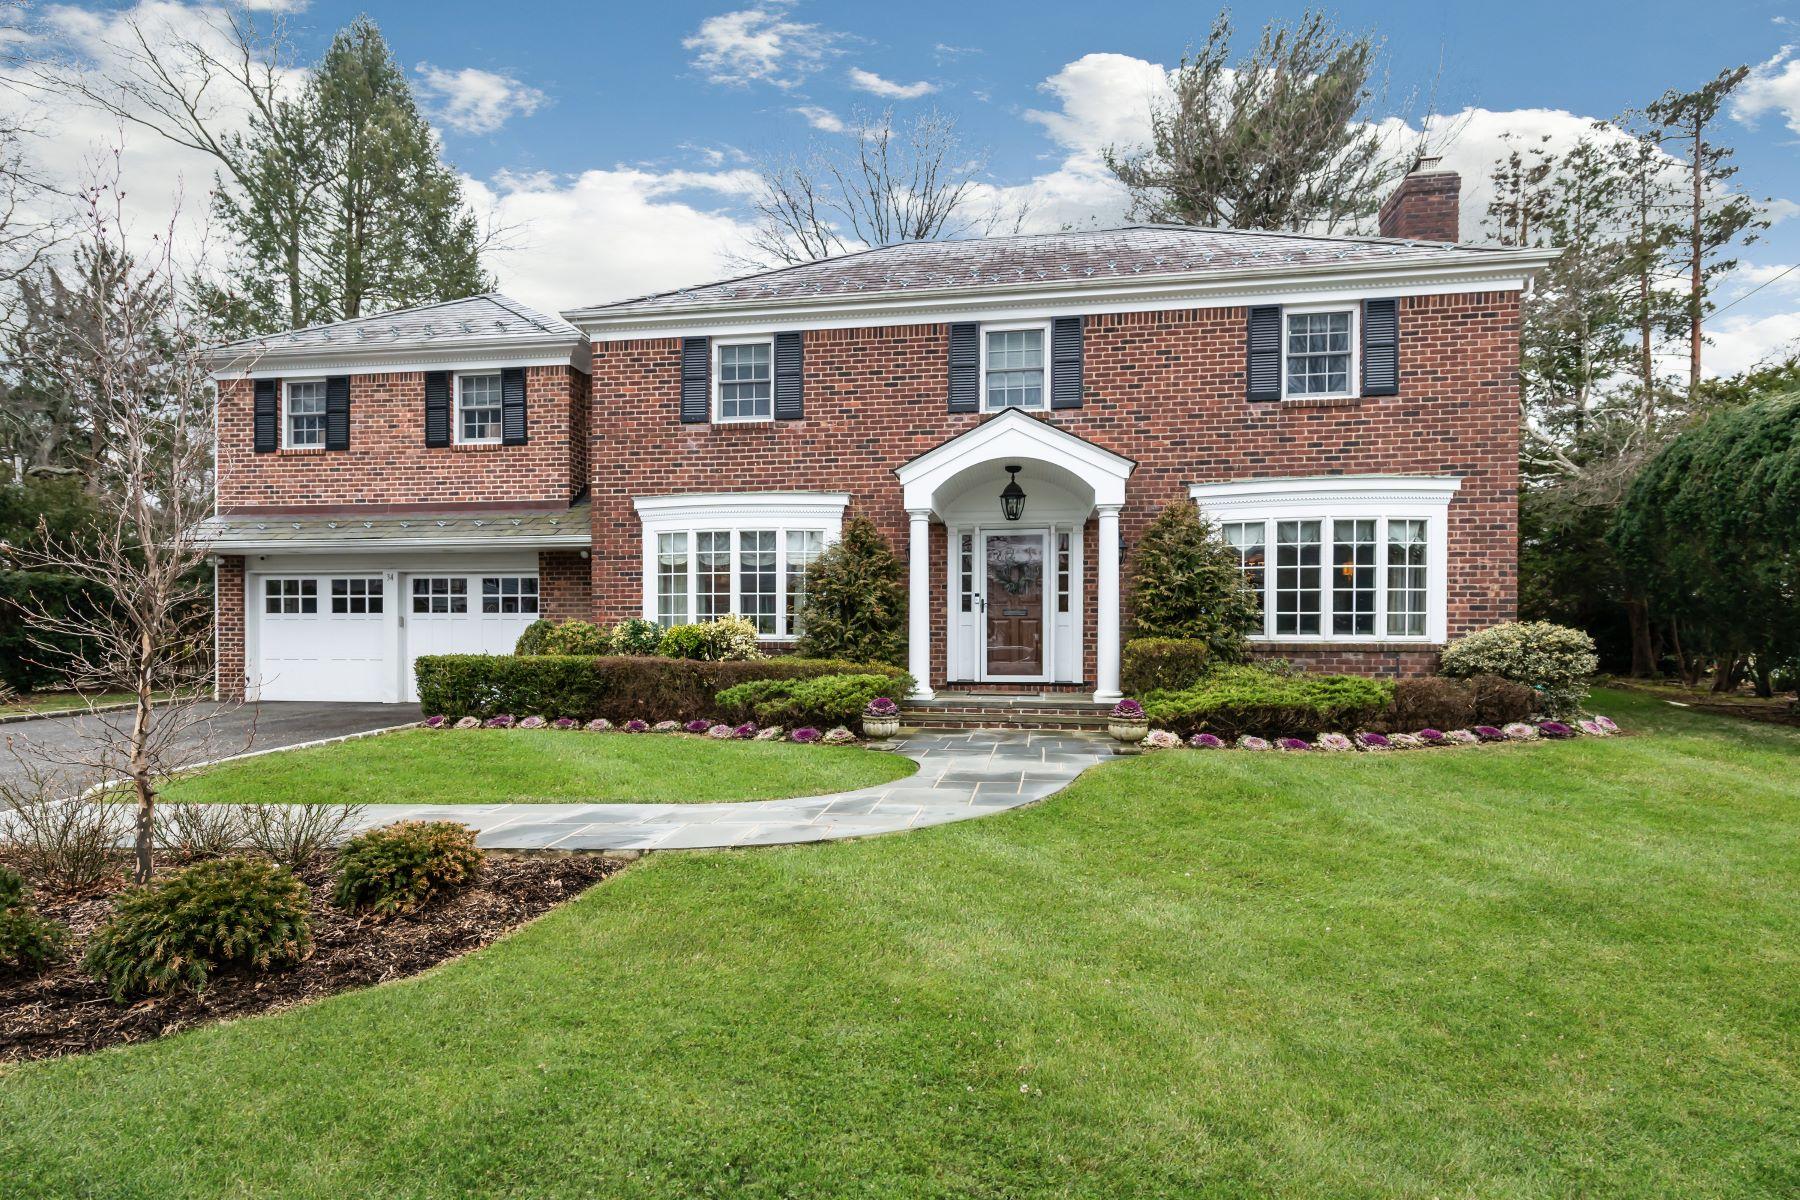 Single Family Homes for Active at Manhasset 34 Vanderlyn Dr Manhasset, New York 11030 United States